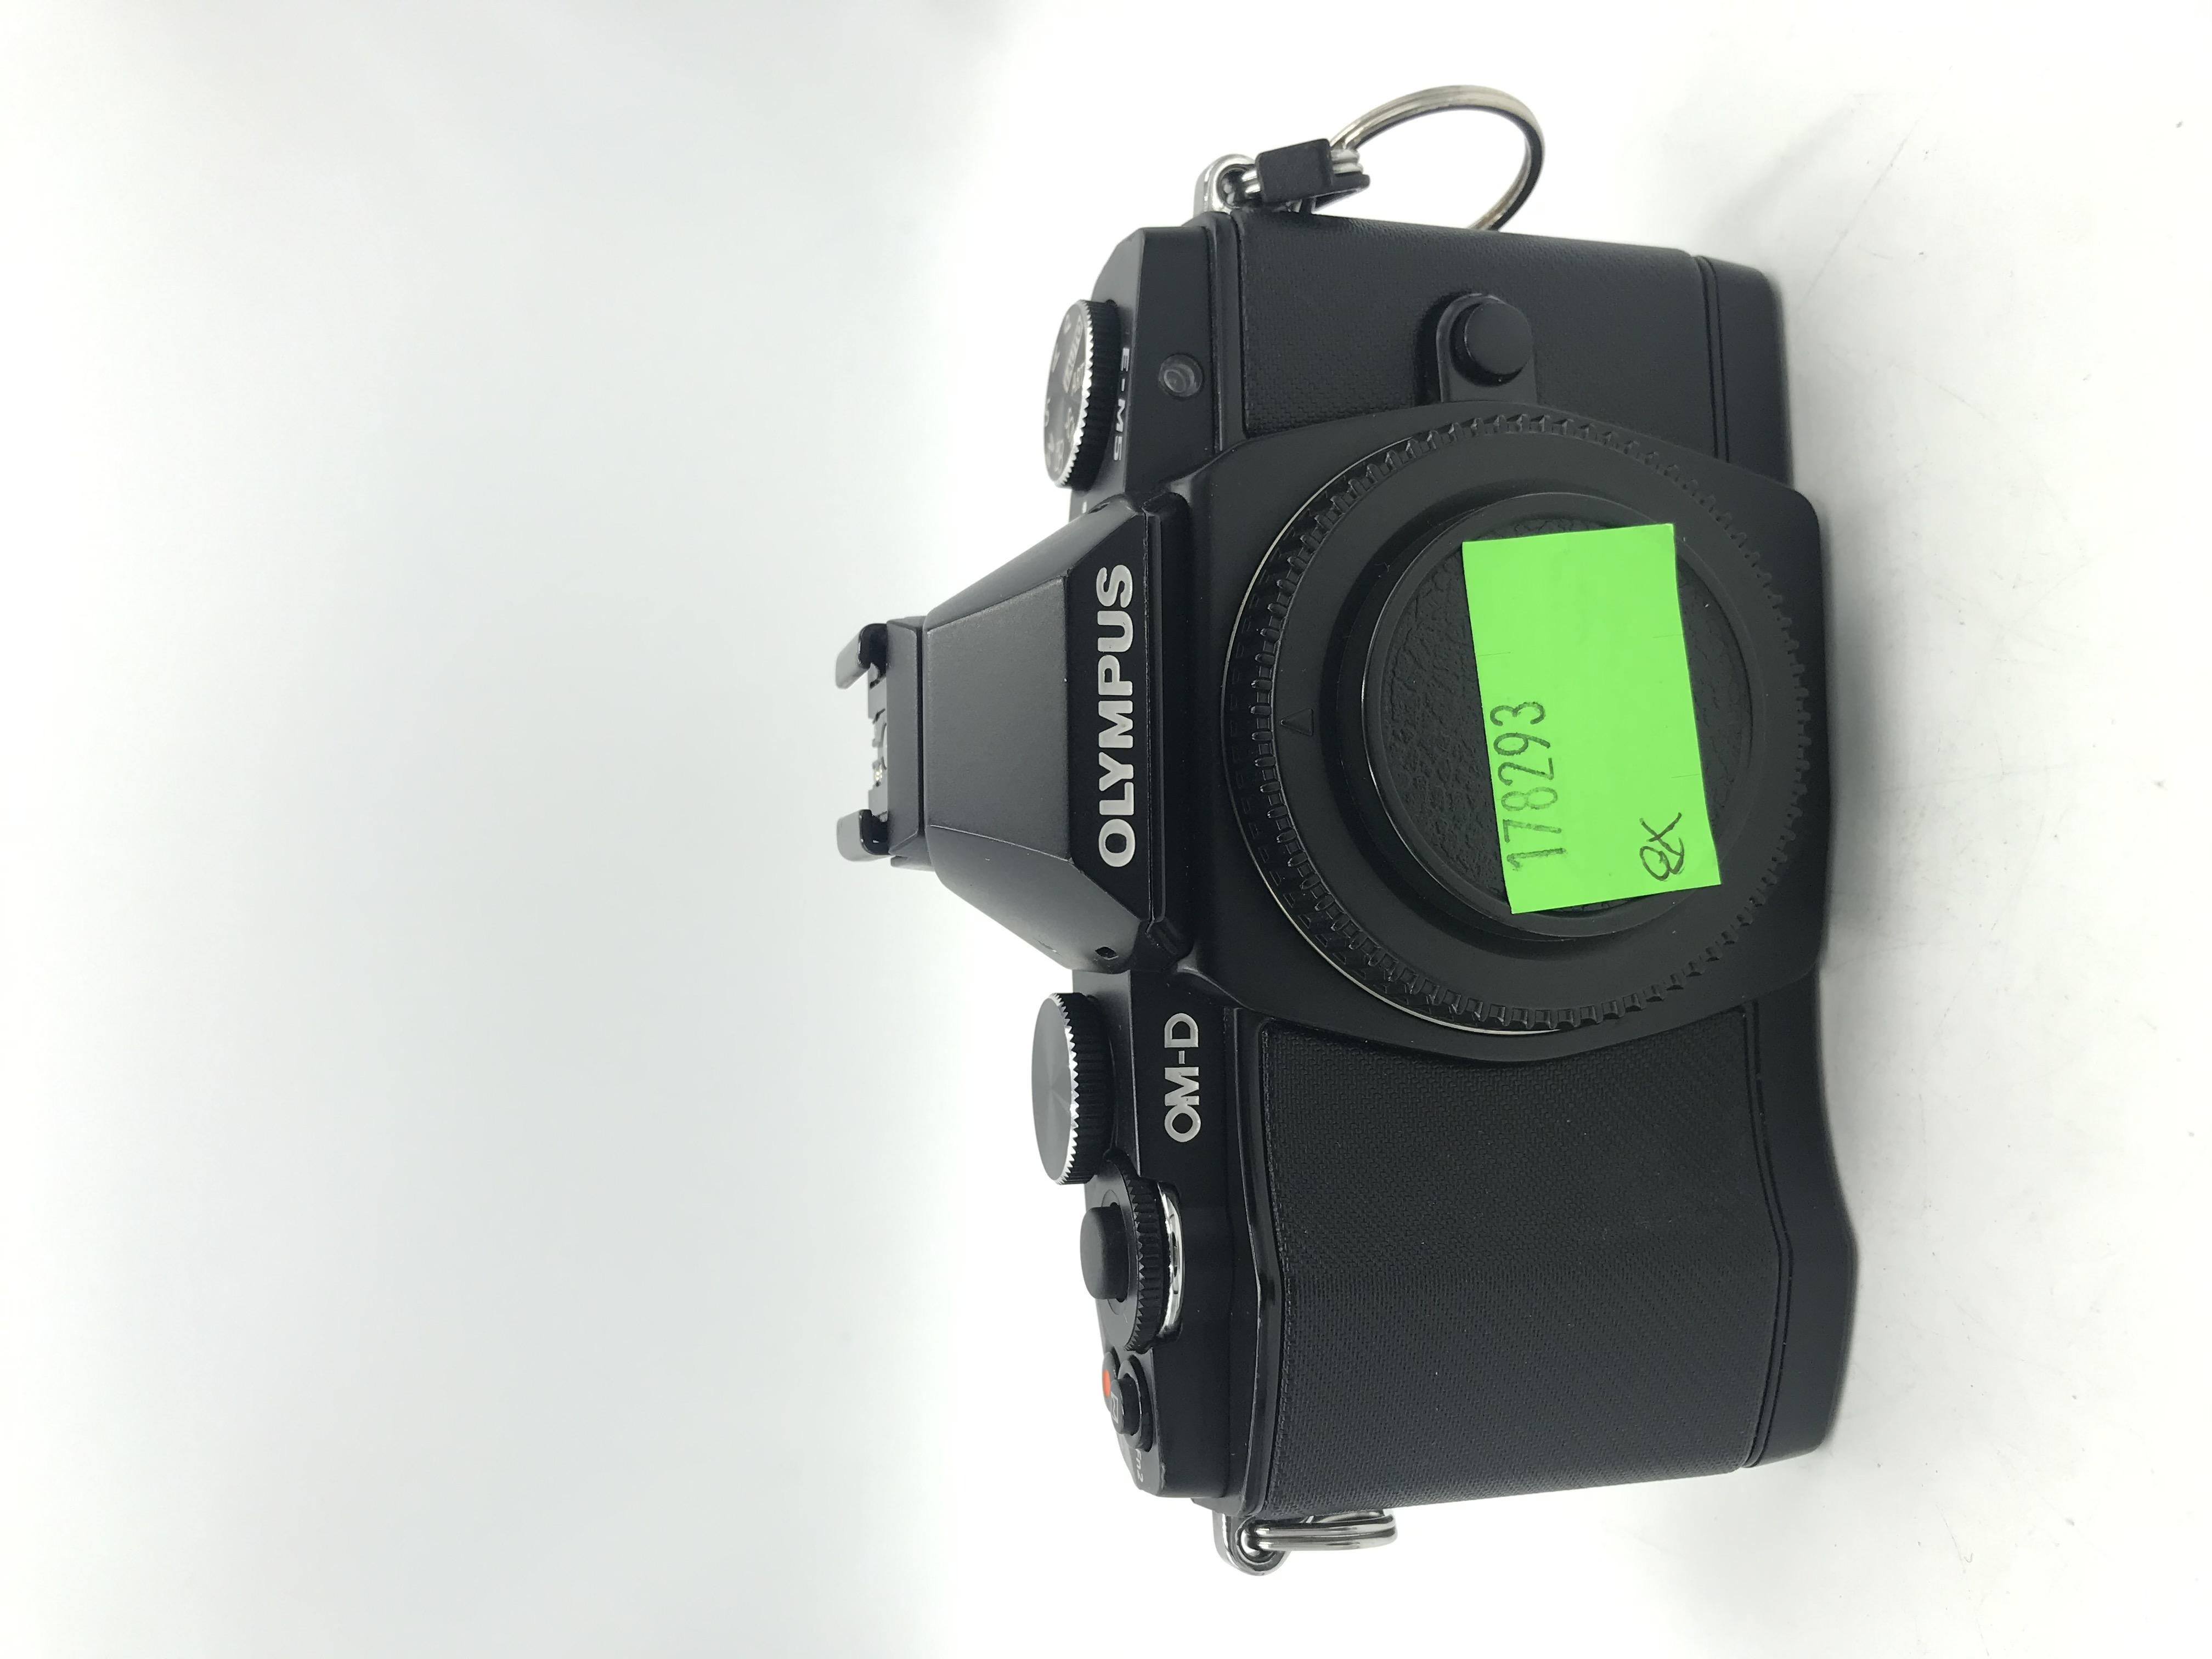 USED Olympus OM-D E-M5 Micro Four Thirds